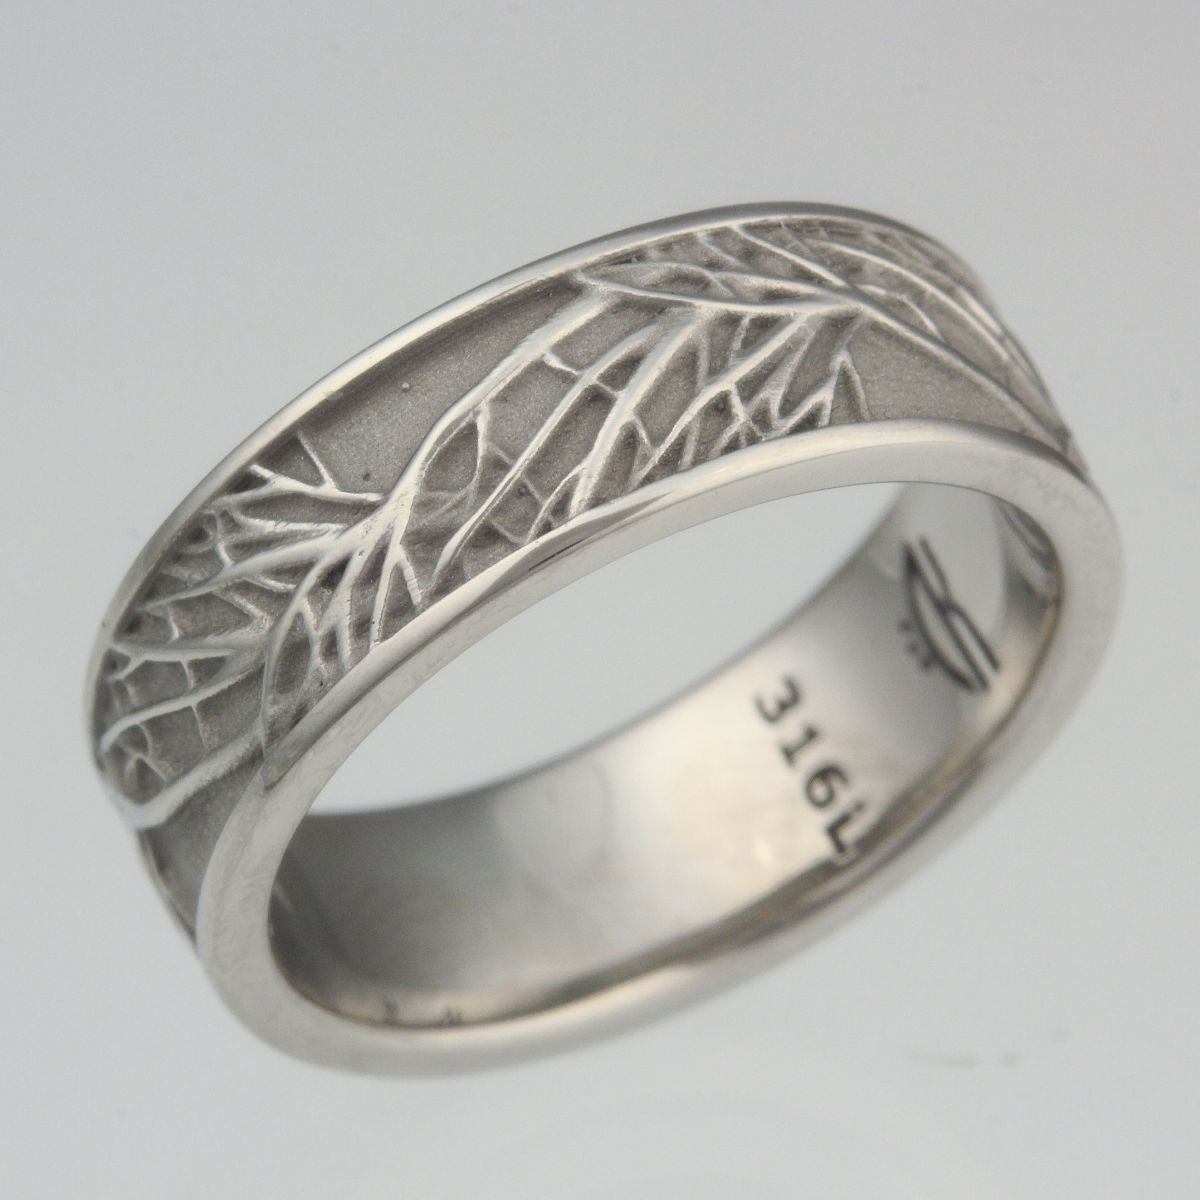 69 nickel allergy wedding ring sparkling platinum